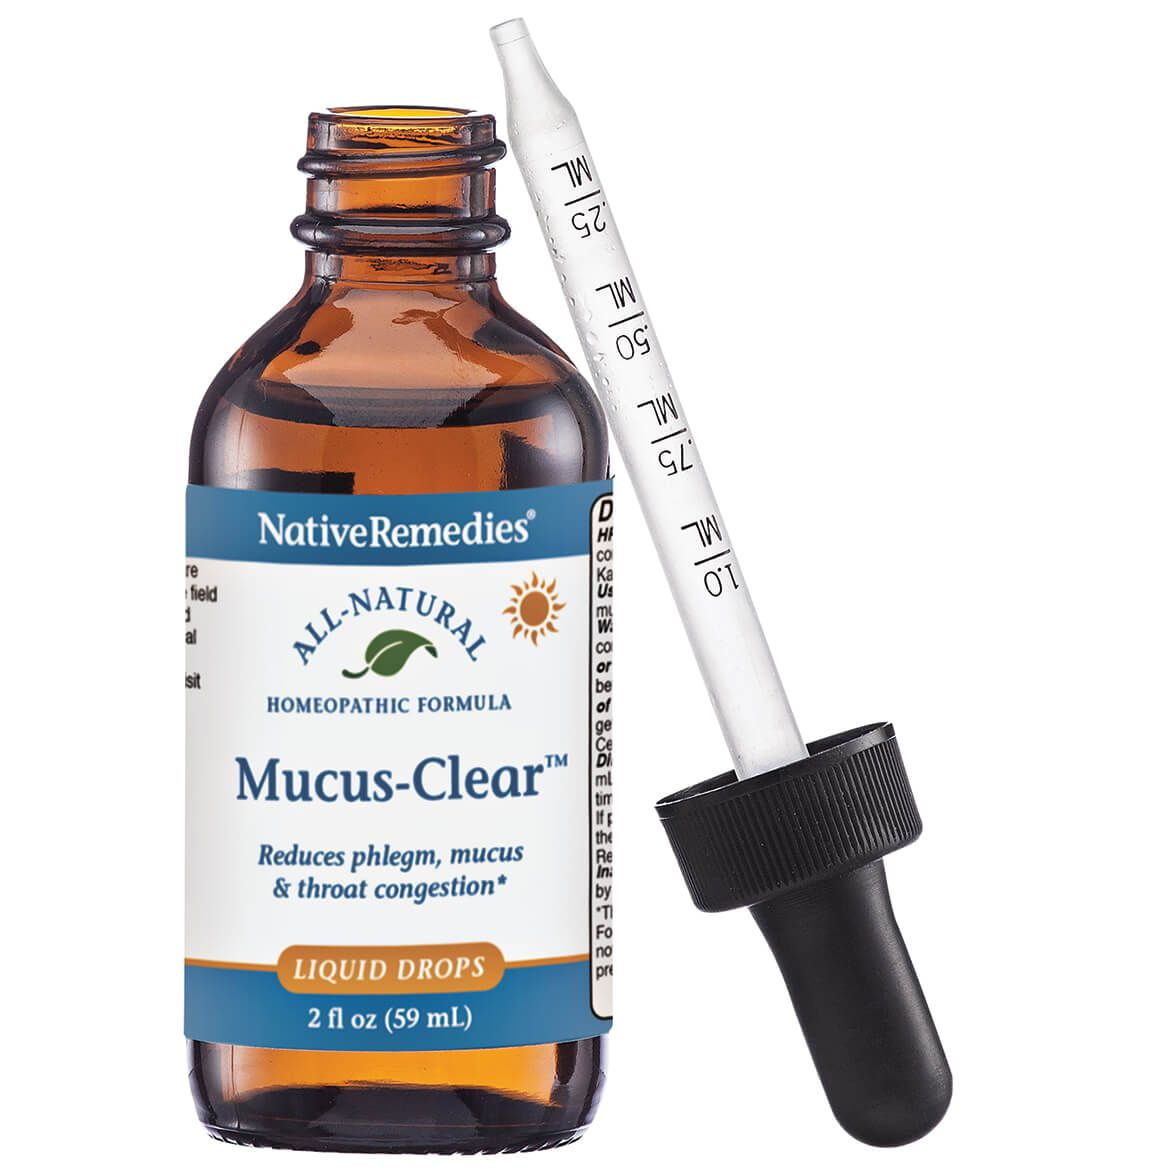 NativeRemedies® Mucus-Clear™-343693